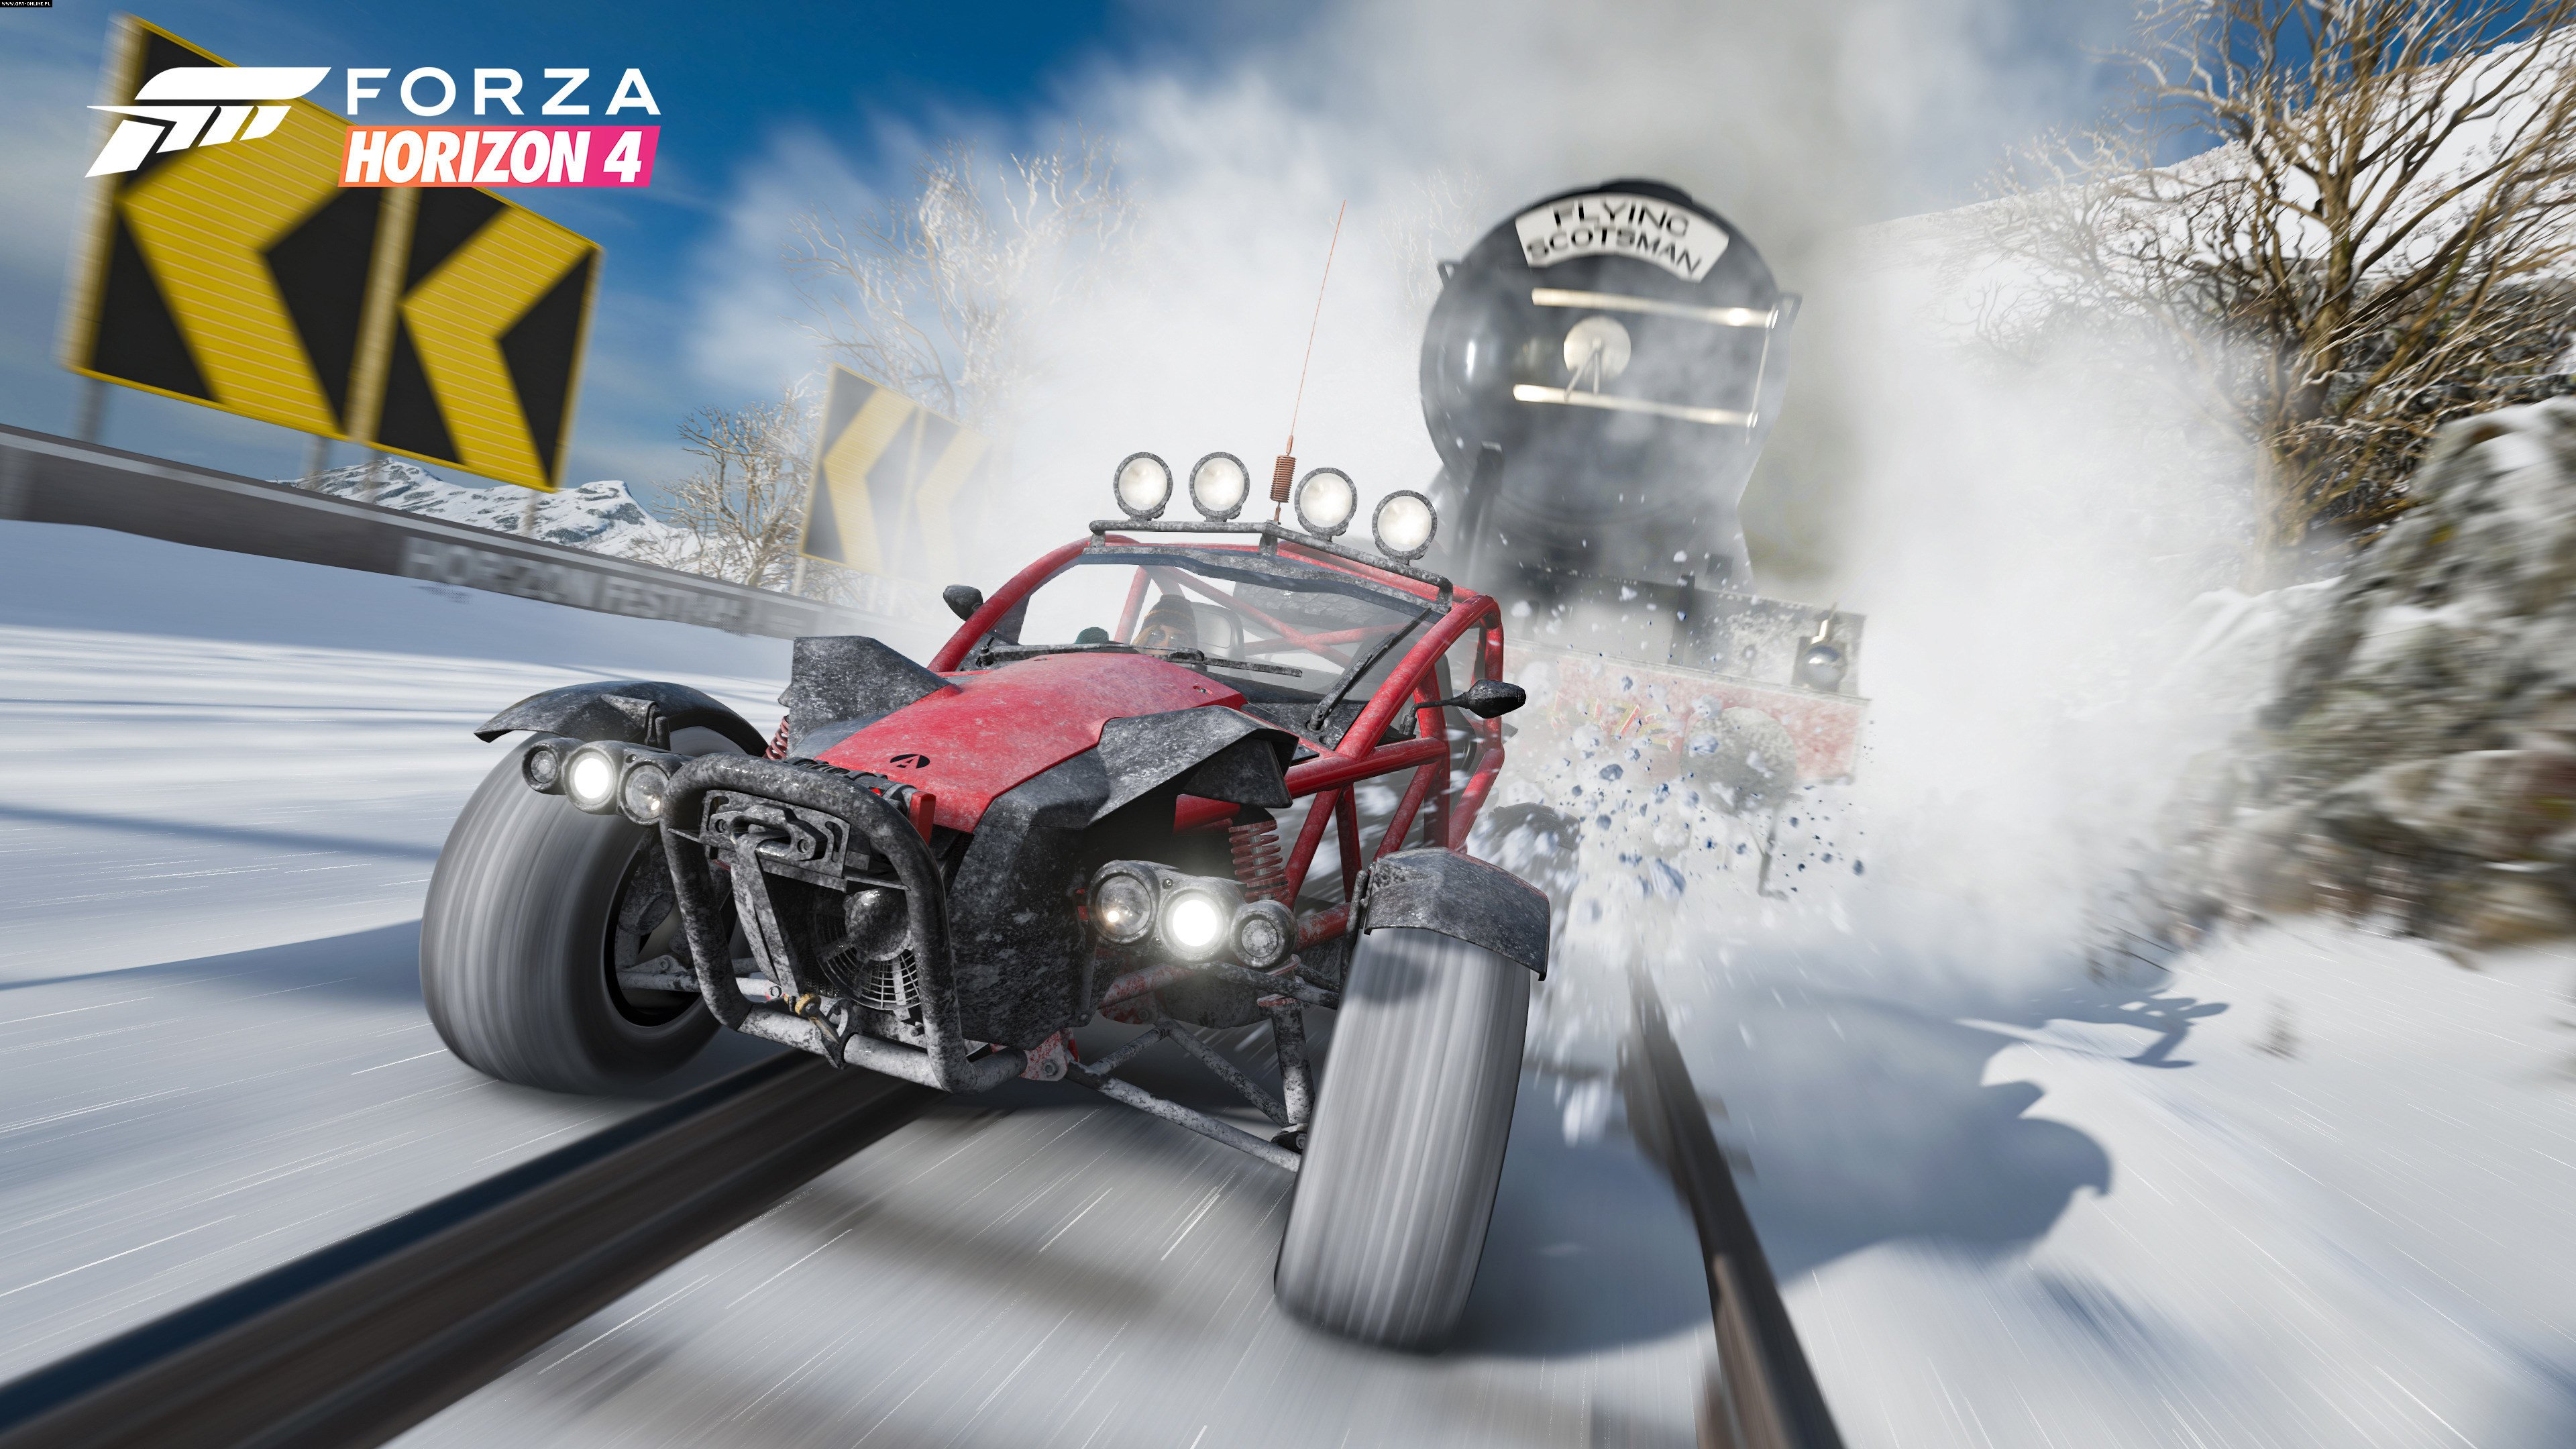 Forza Horizon 4 download PC | Bandits Game - Download and hack